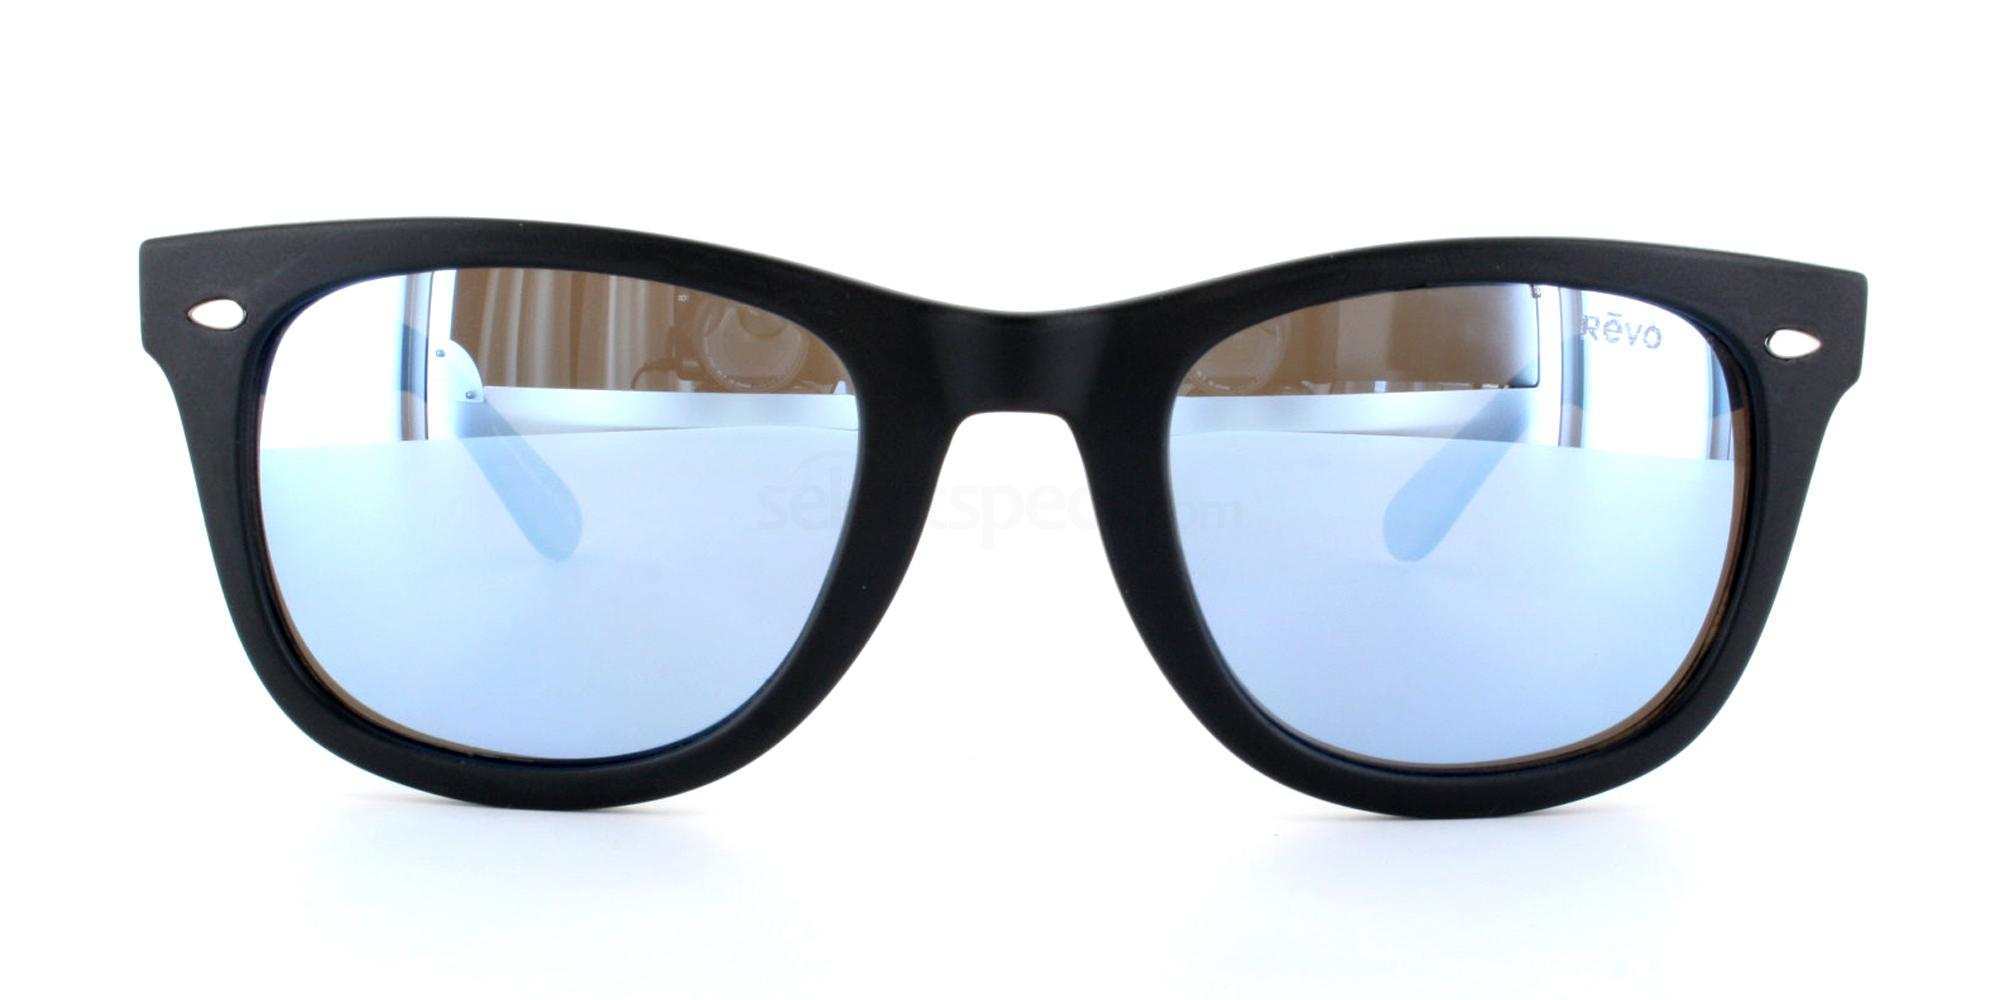 01BL Bear Grylls Forge - RE1096 Sunglasses, Revo